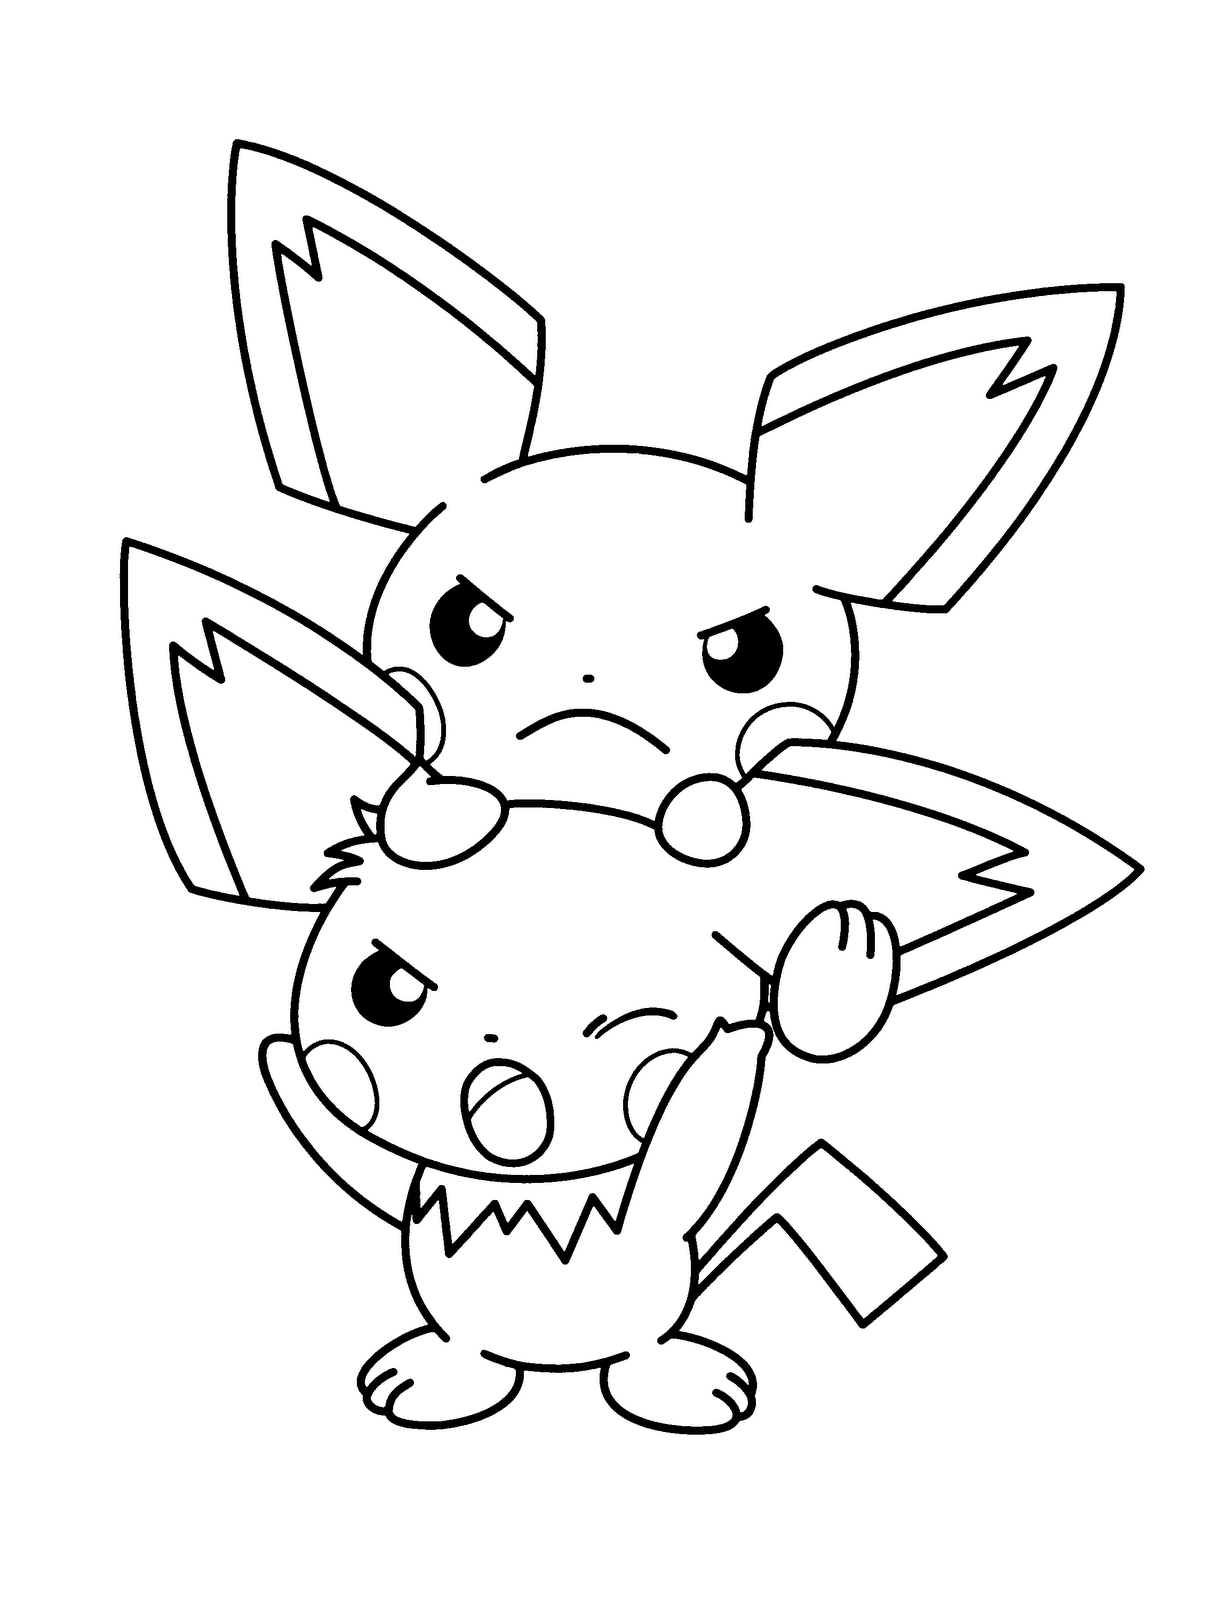 1000 images about pokemon art on pinterest pokemon coloring